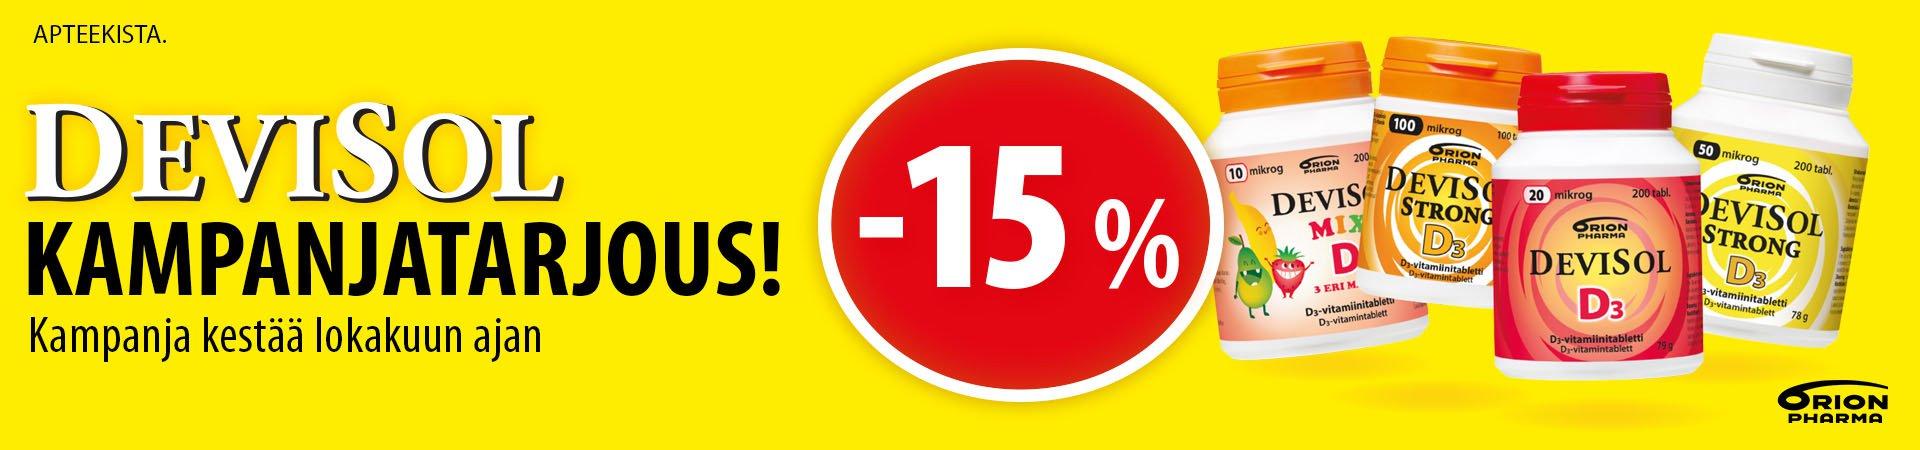 Devisol -15% lokakussa